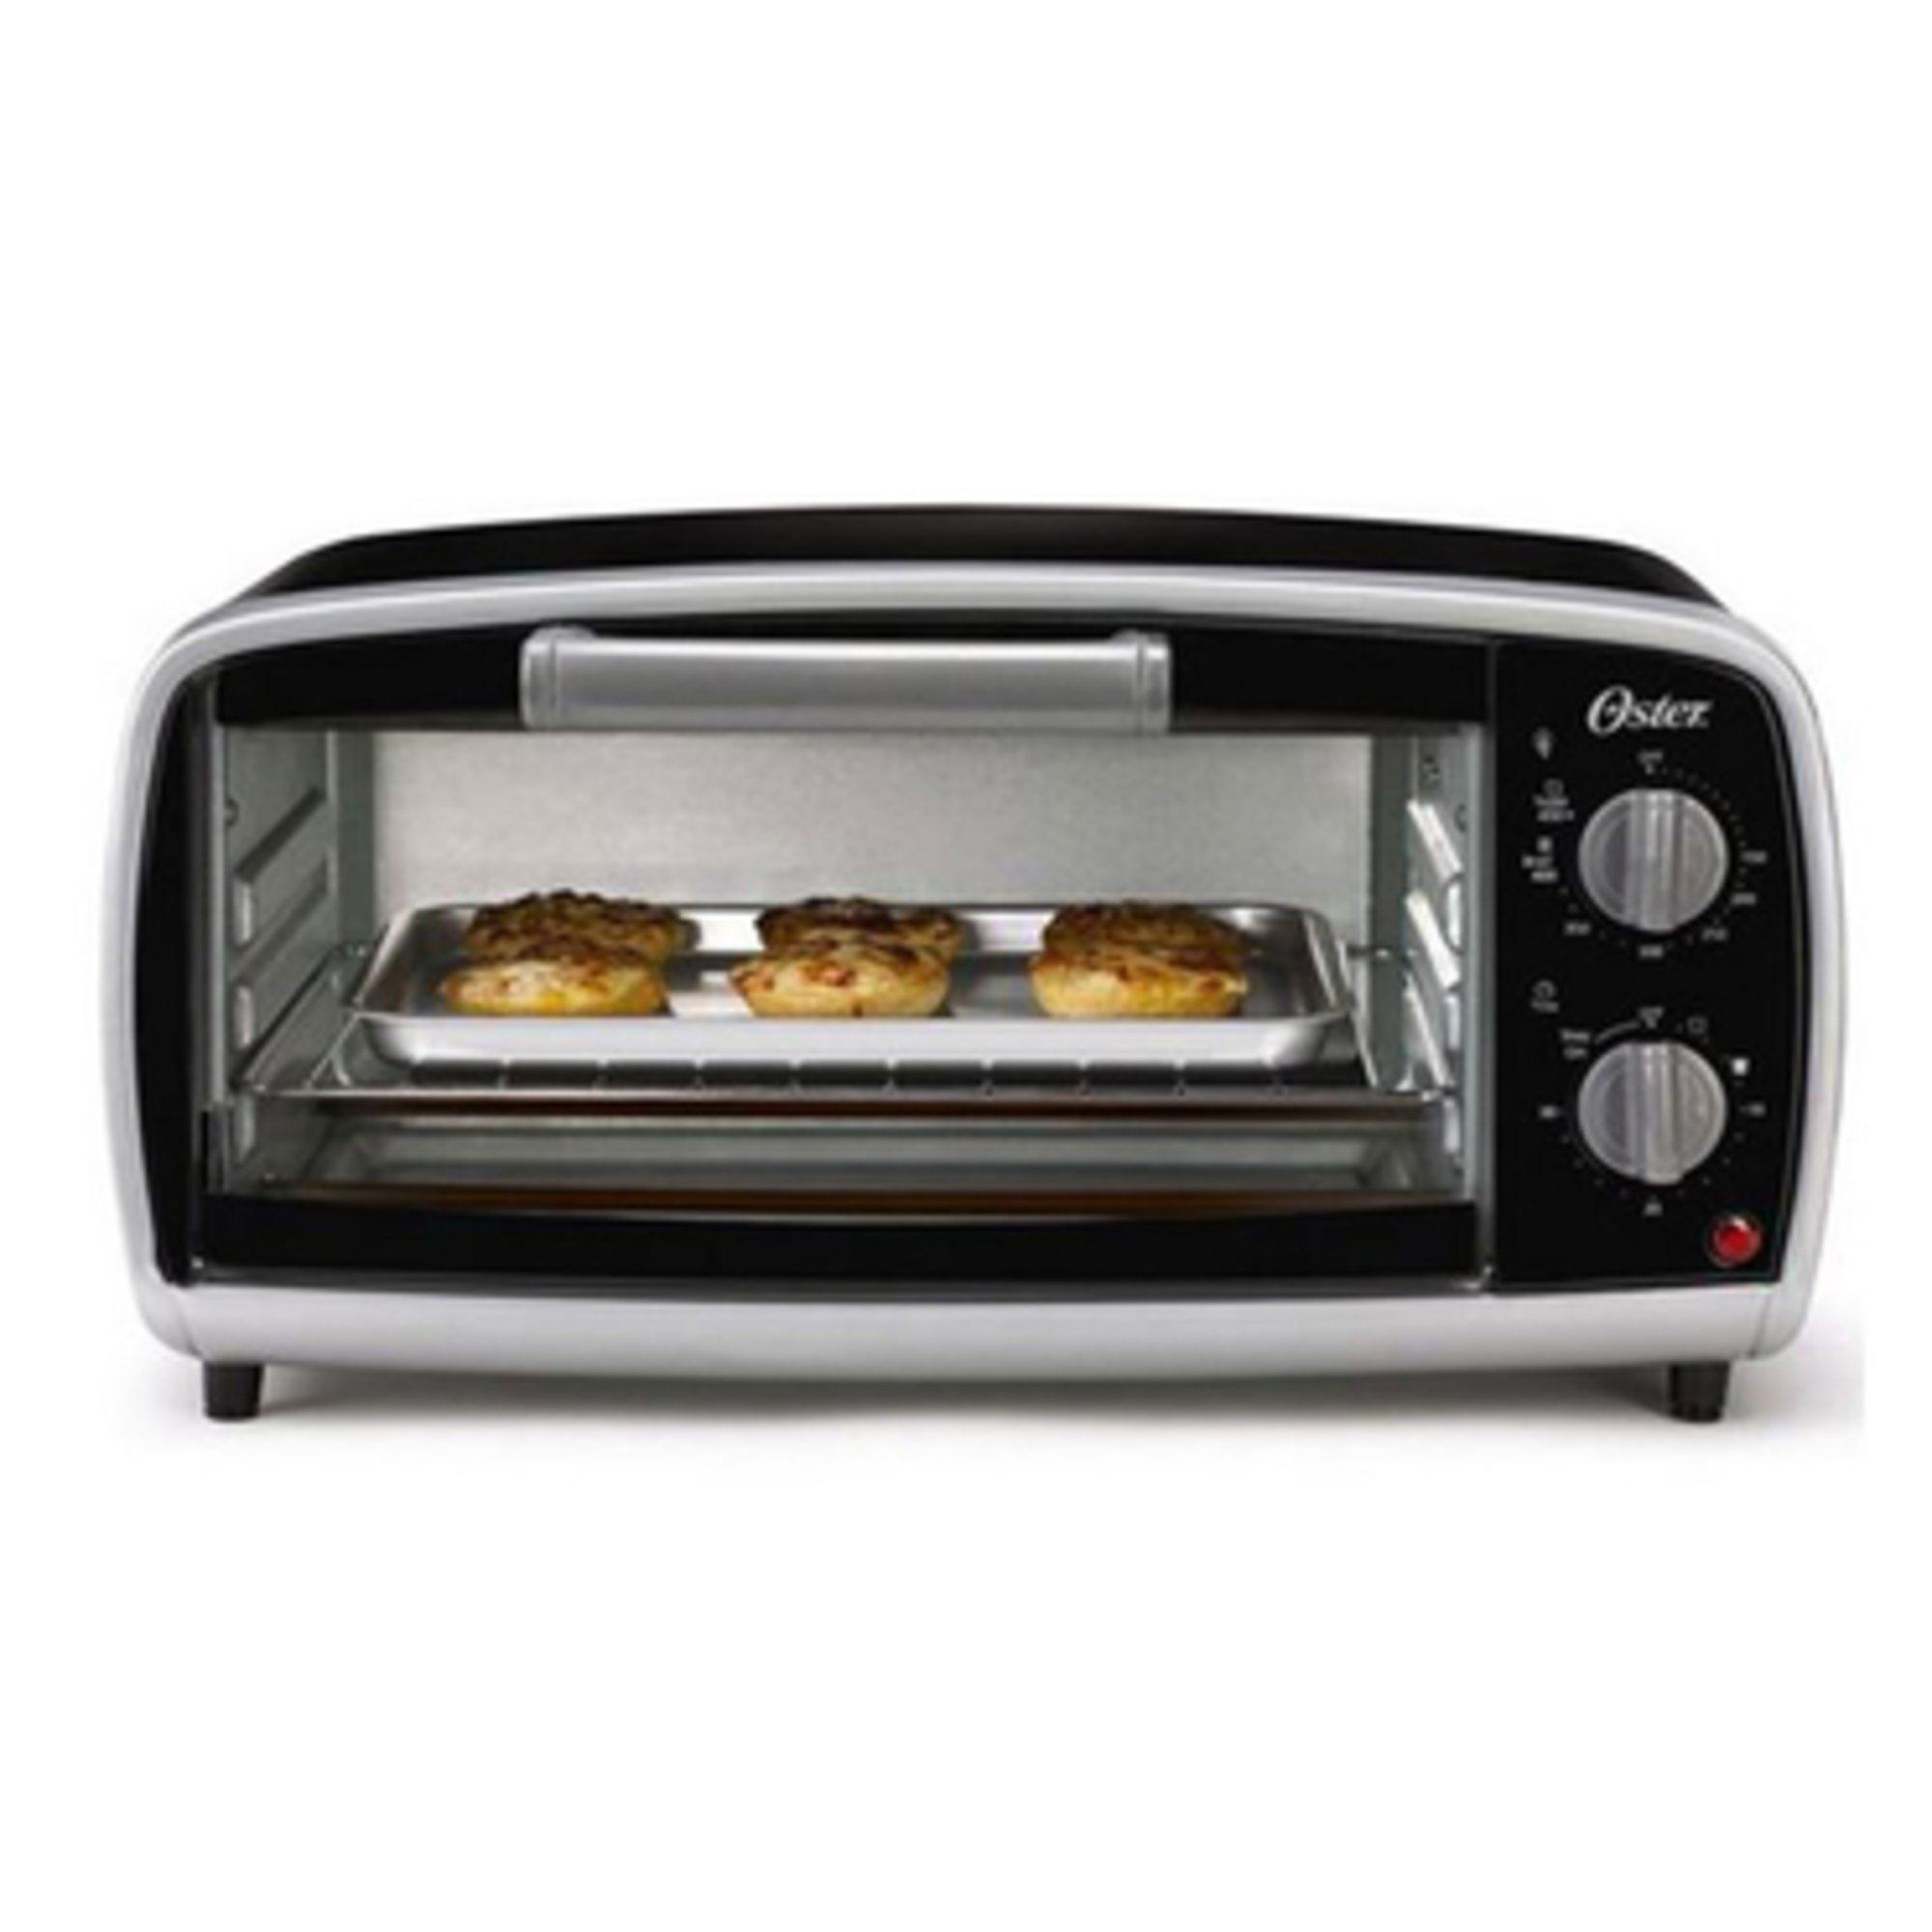 Oster 4 Slice Toaster Oven Tssttvvg01 Toasters